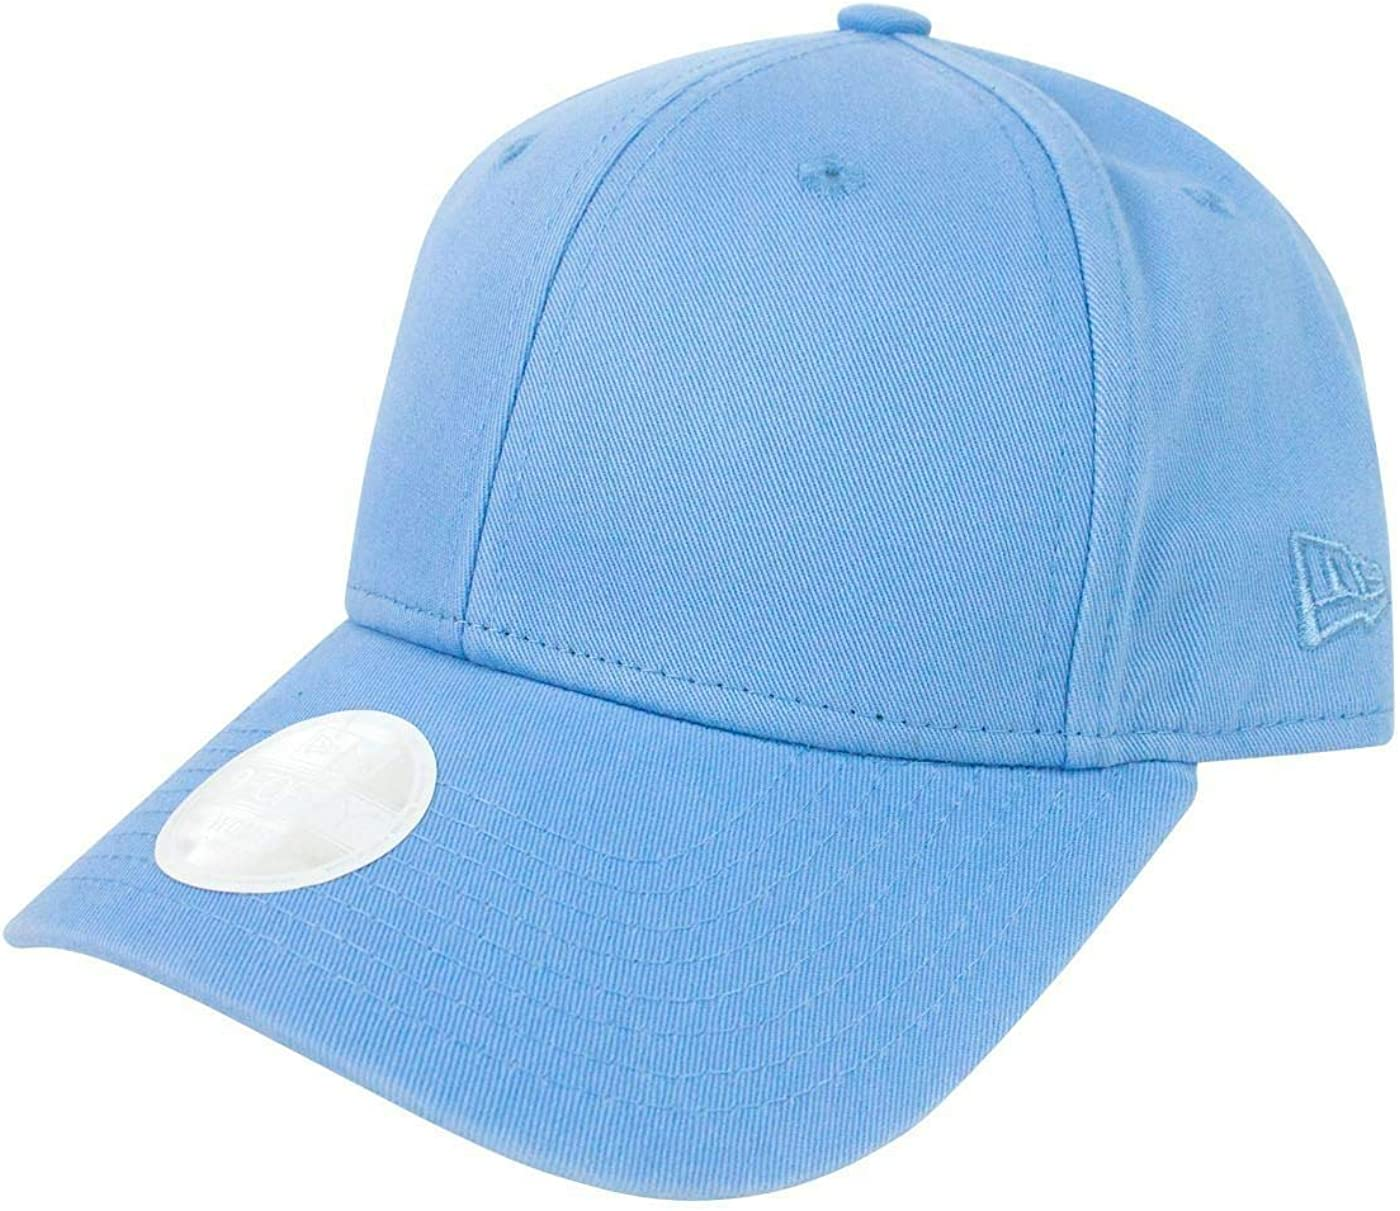 New Era 9Forty Pastel Blue Womens Cap